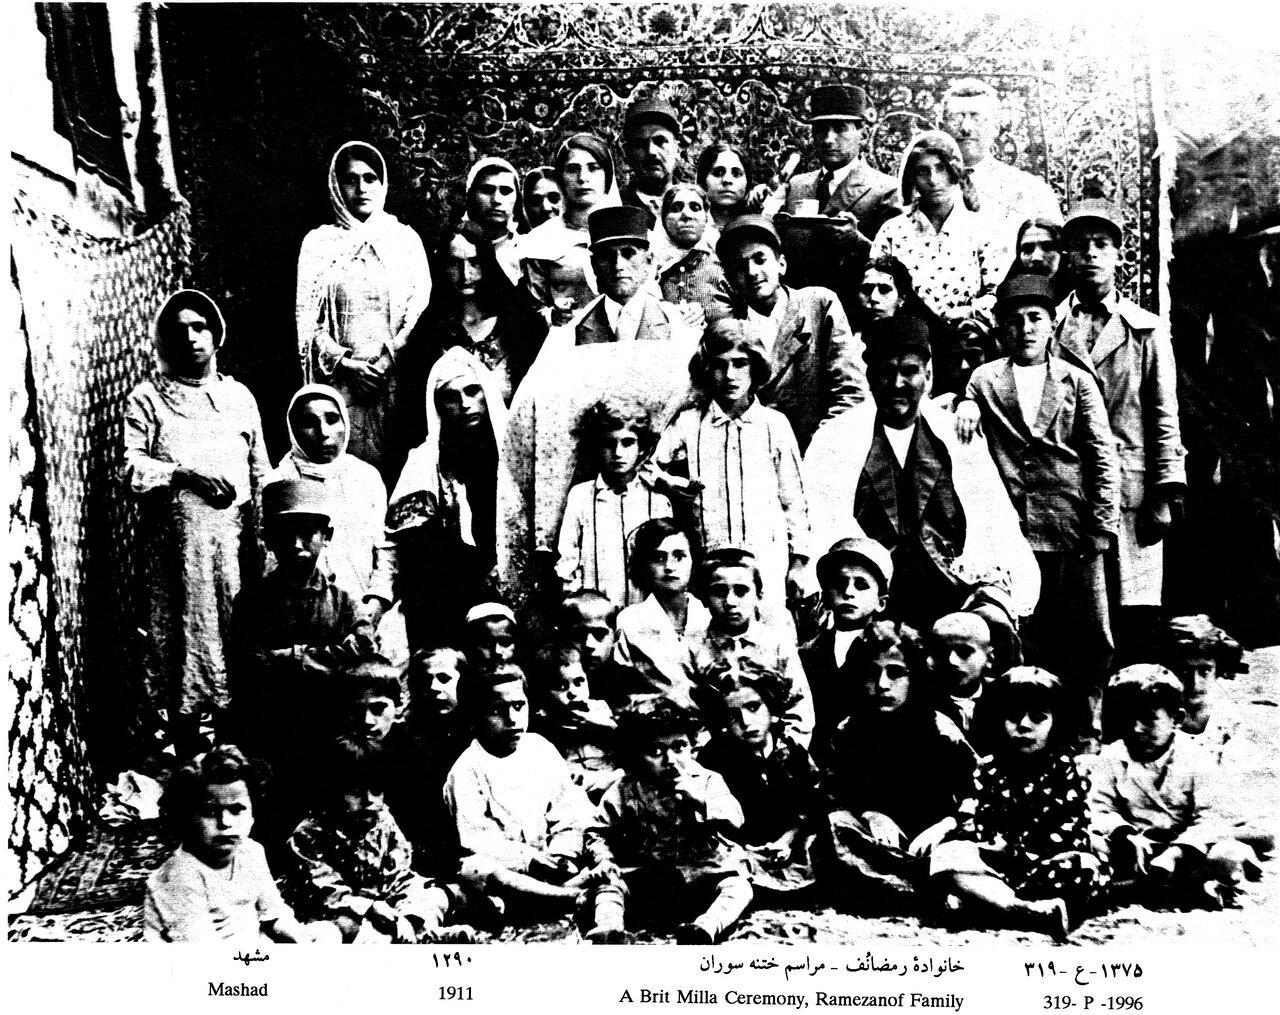 Церемония Брит-Мила. Семья Рамазанав, Мешхед, 1911